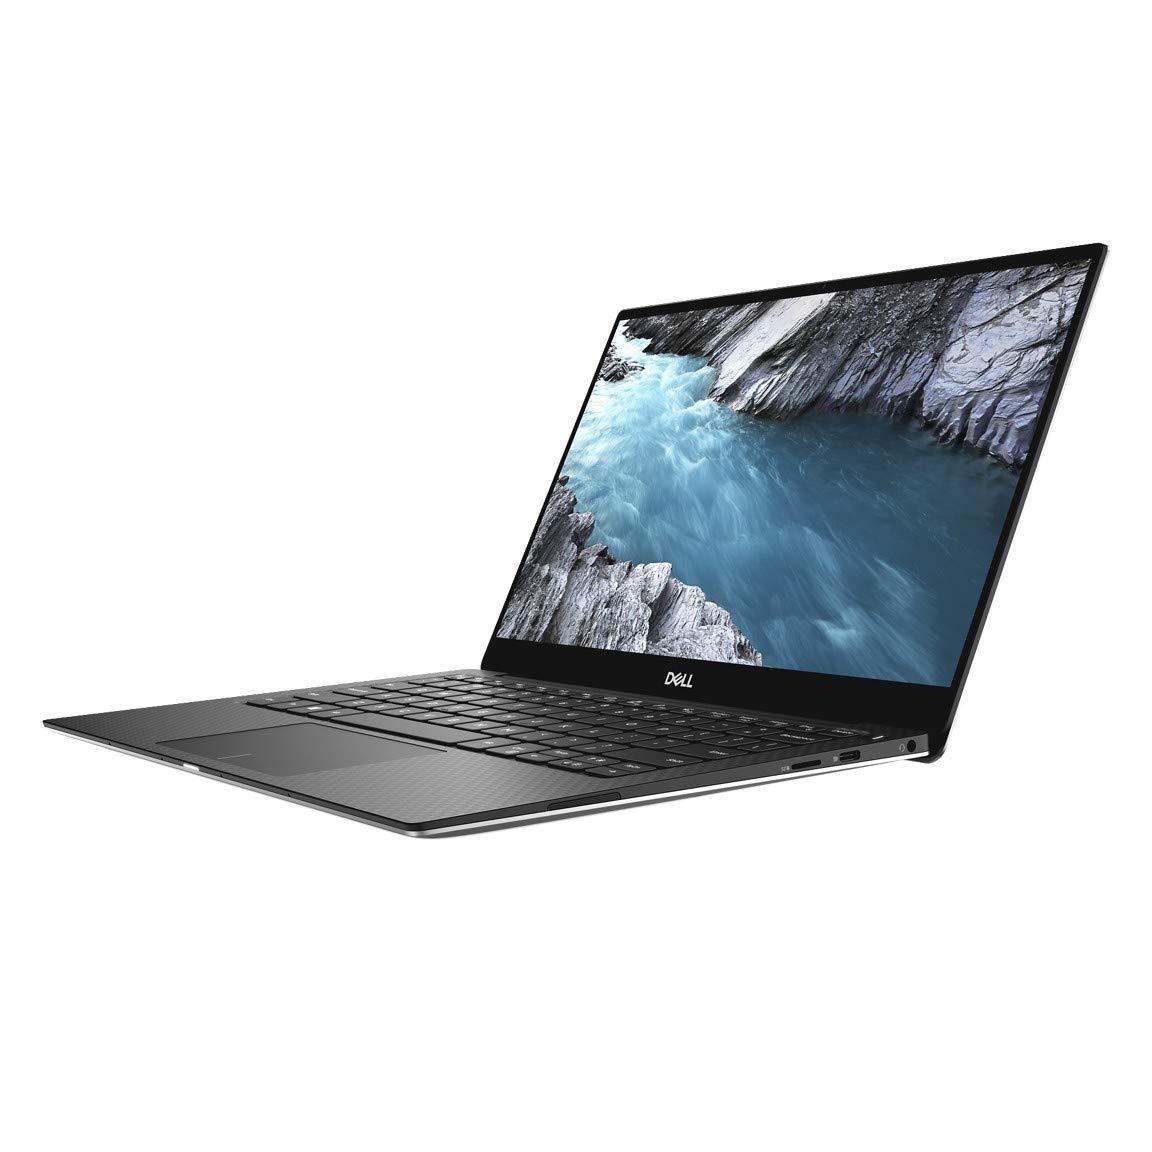 Dell XPS Core i7-11th Gen RAM-16GB SSD-1TB Shared Graphics Windows-10 Screen-13.4Inch Silver 13-XPS-M2500-SLV